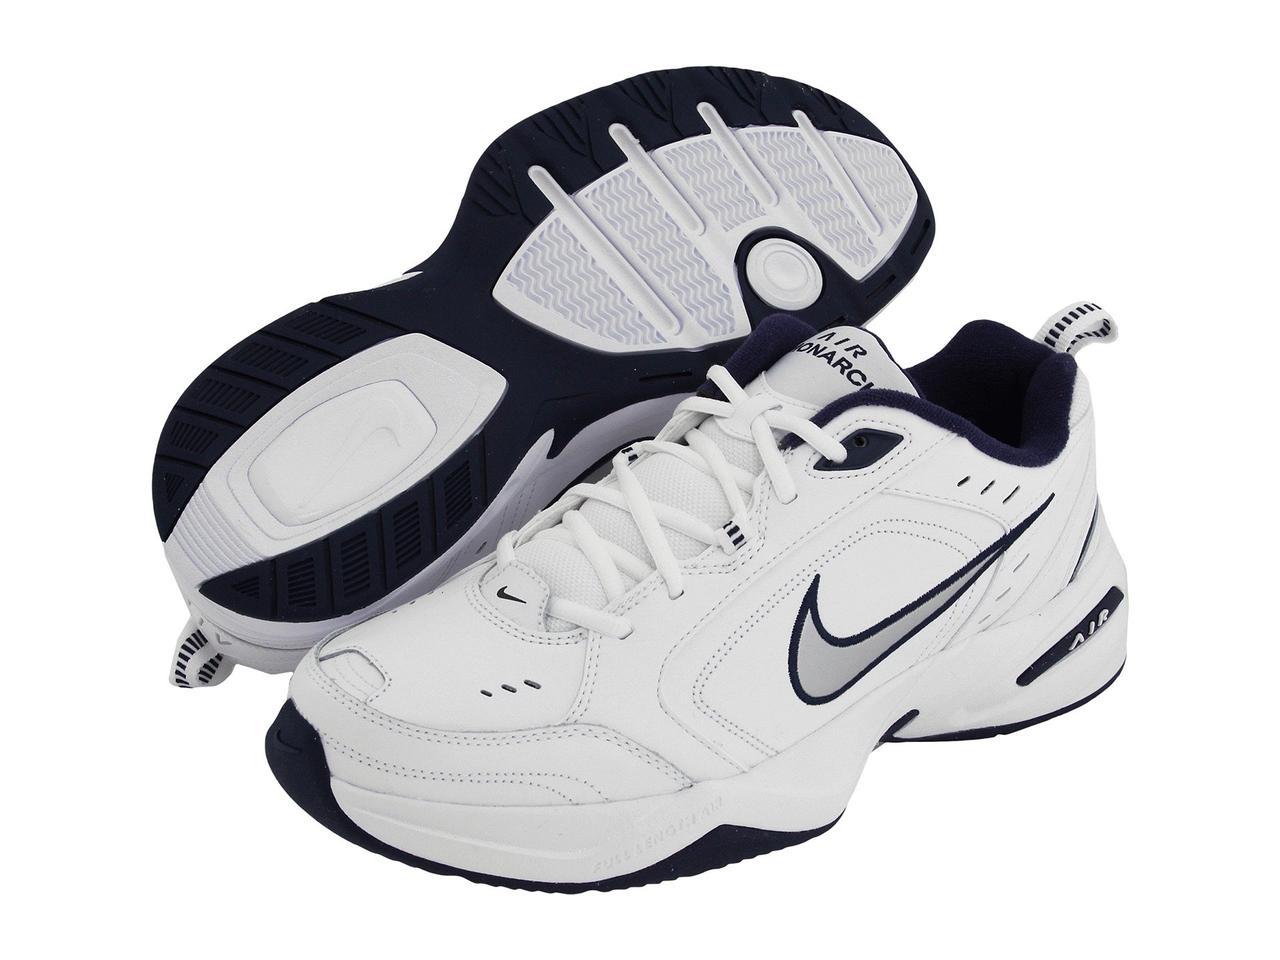 aeaa945d52b3 Кроссовки Кеды (Оригинал) Nike Air Monarch IV White Metallic Silver-Midnight